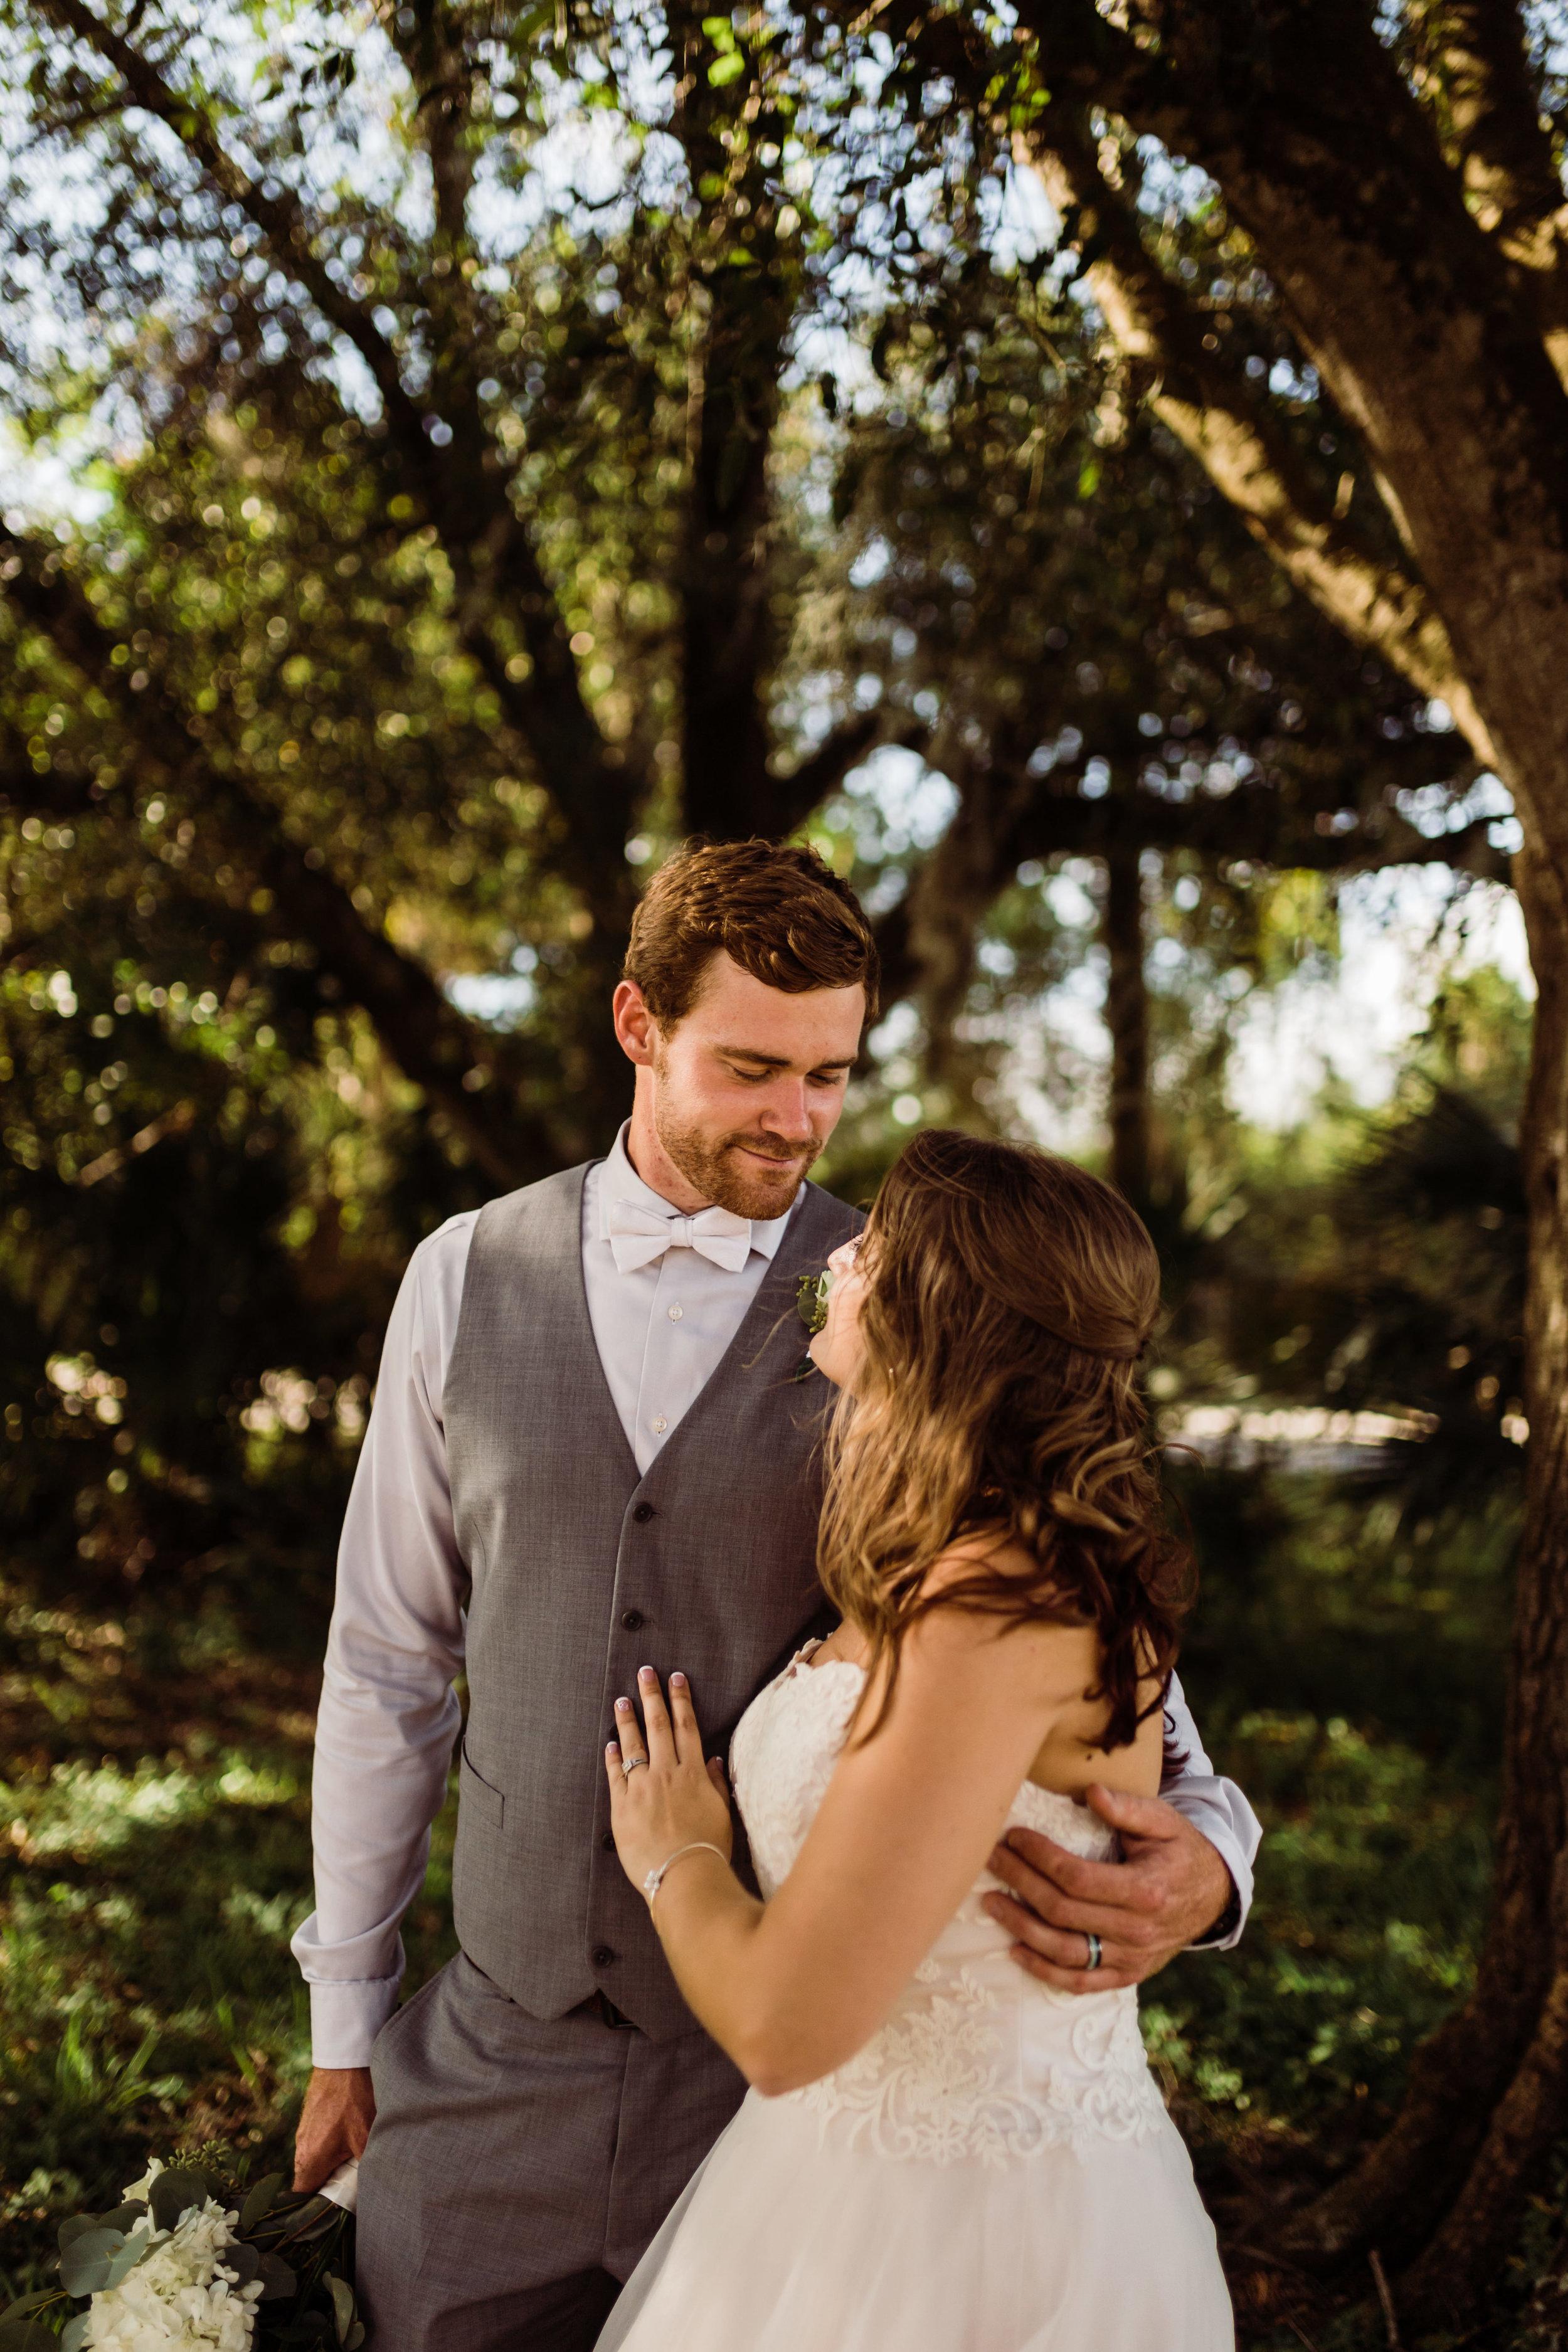 2017.10.14 Samantha and Matthew Crabtree Sarasota Wedding (365 of 708).jpg